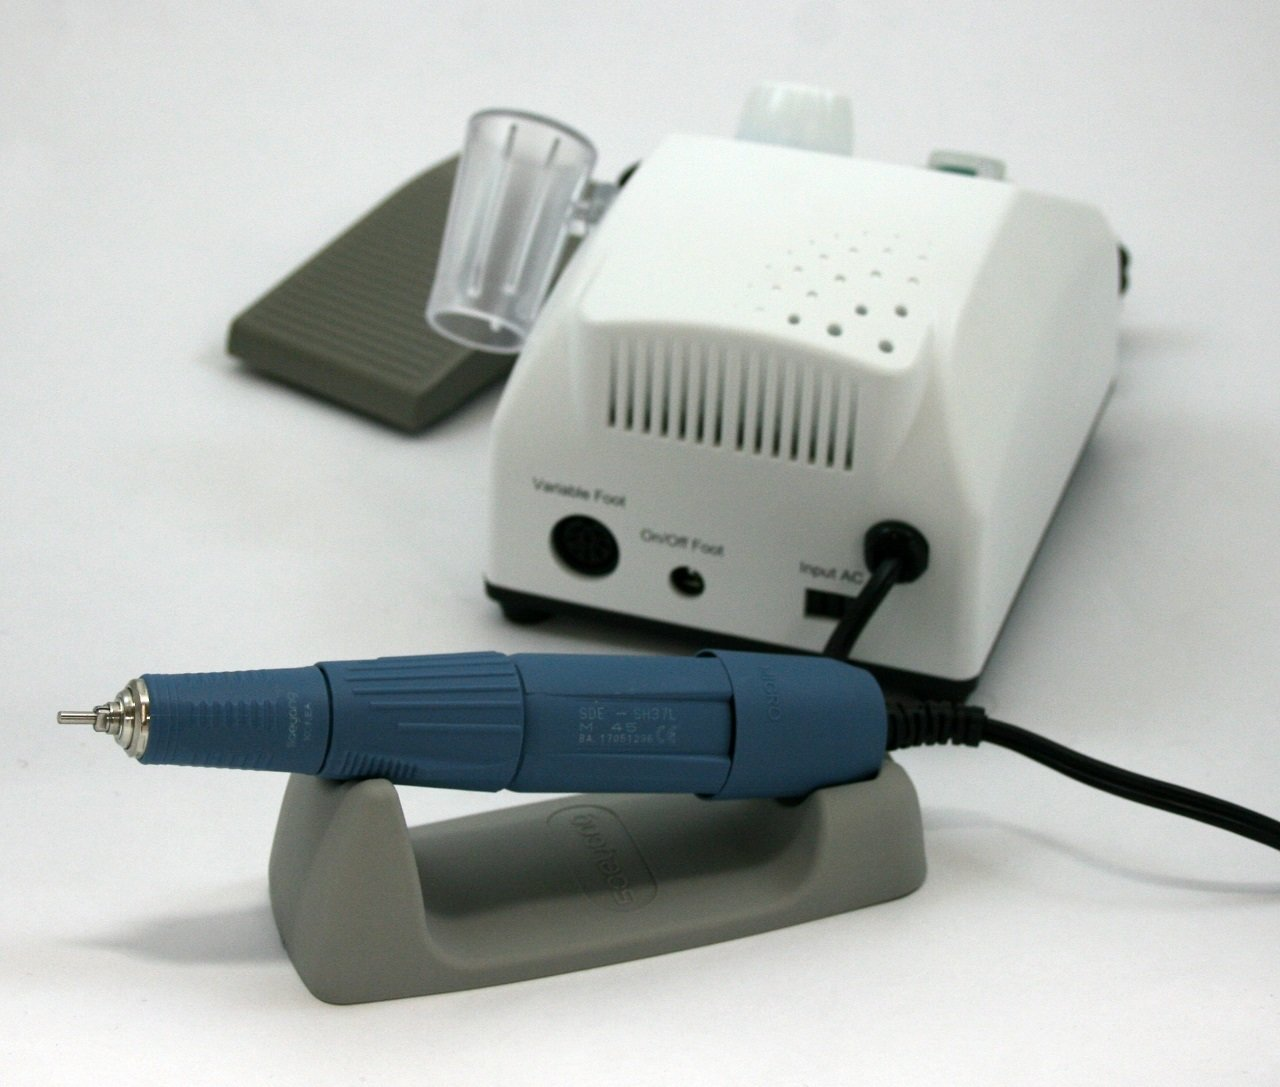 Аппарат для педикюра марафон 7 отзывы